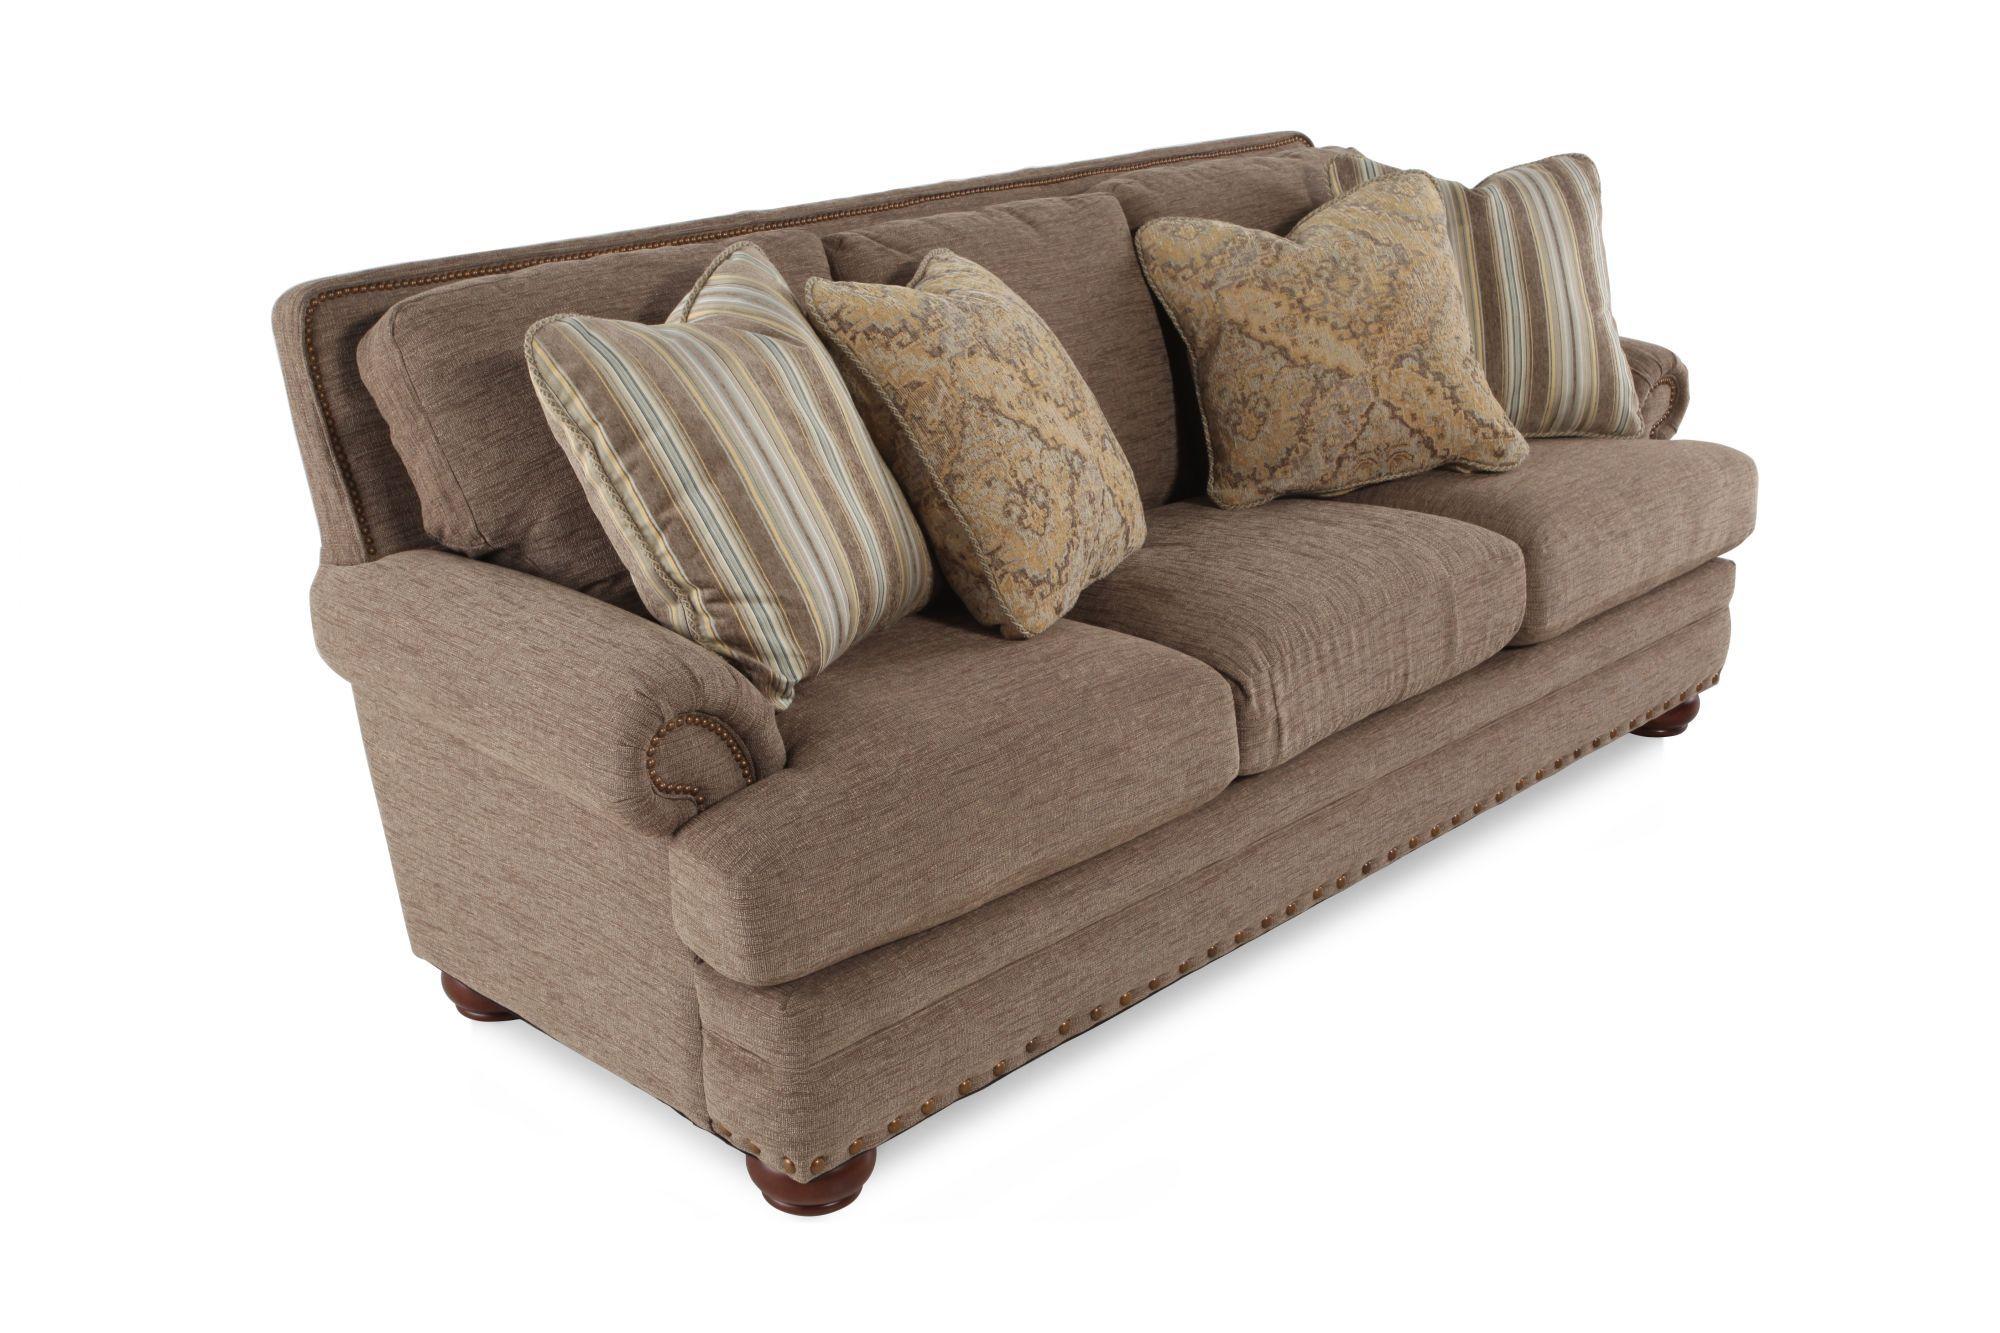 La Z Boy Brennan Bark Sofa | Furniture In 2018 | Pinterest | Sofa Regarding Brennan Sofa Chairs (View 11 of 25)